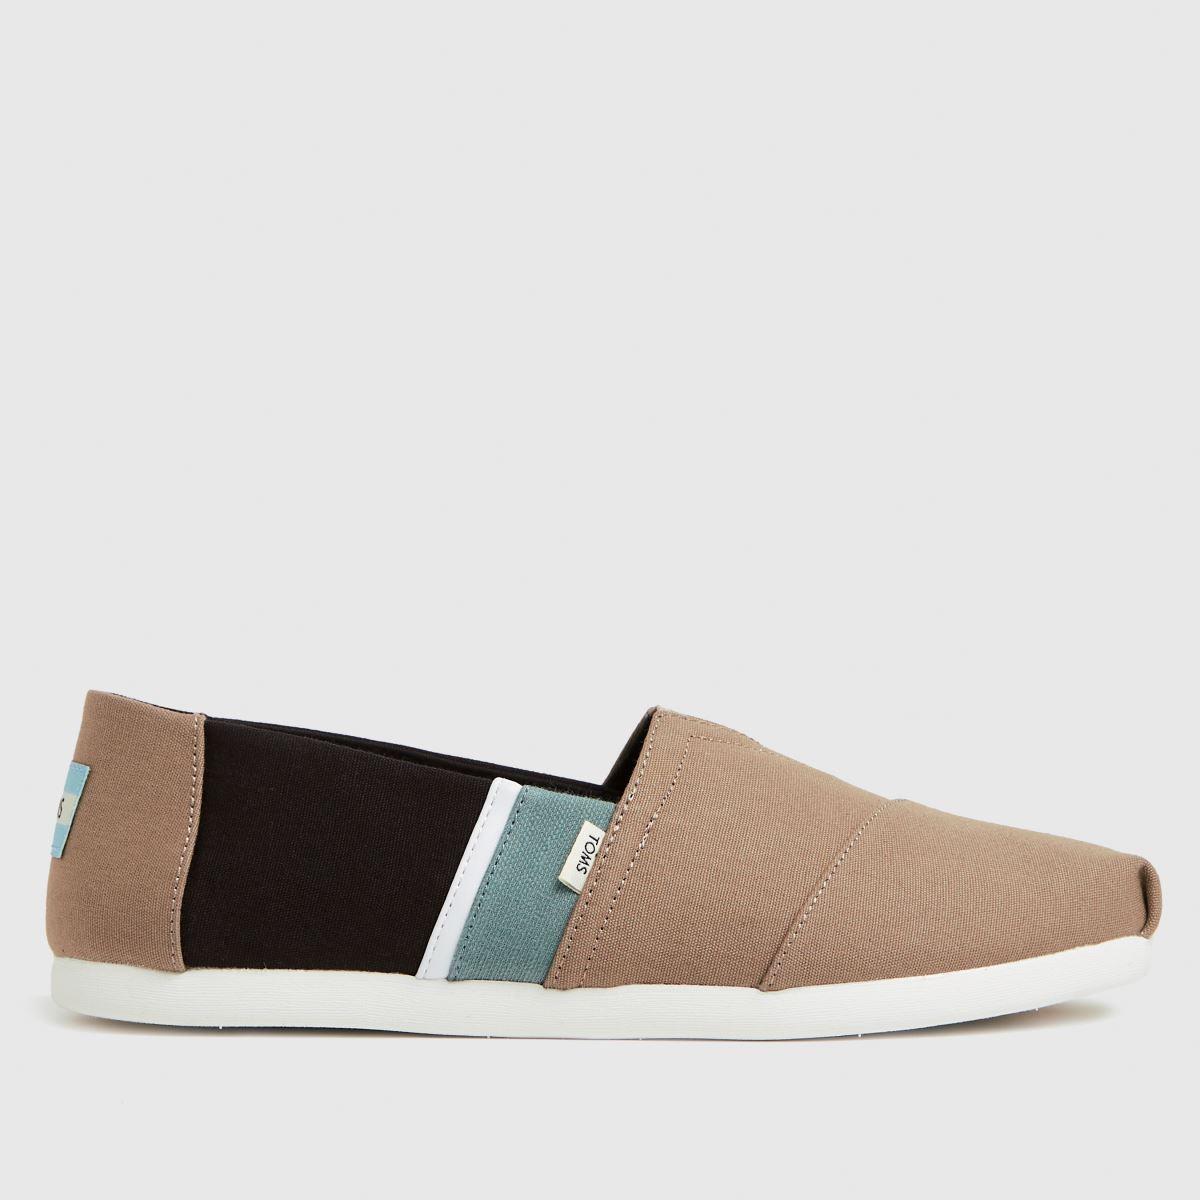 TOMS Stone Alpargata 3.0 Vegan Shoes